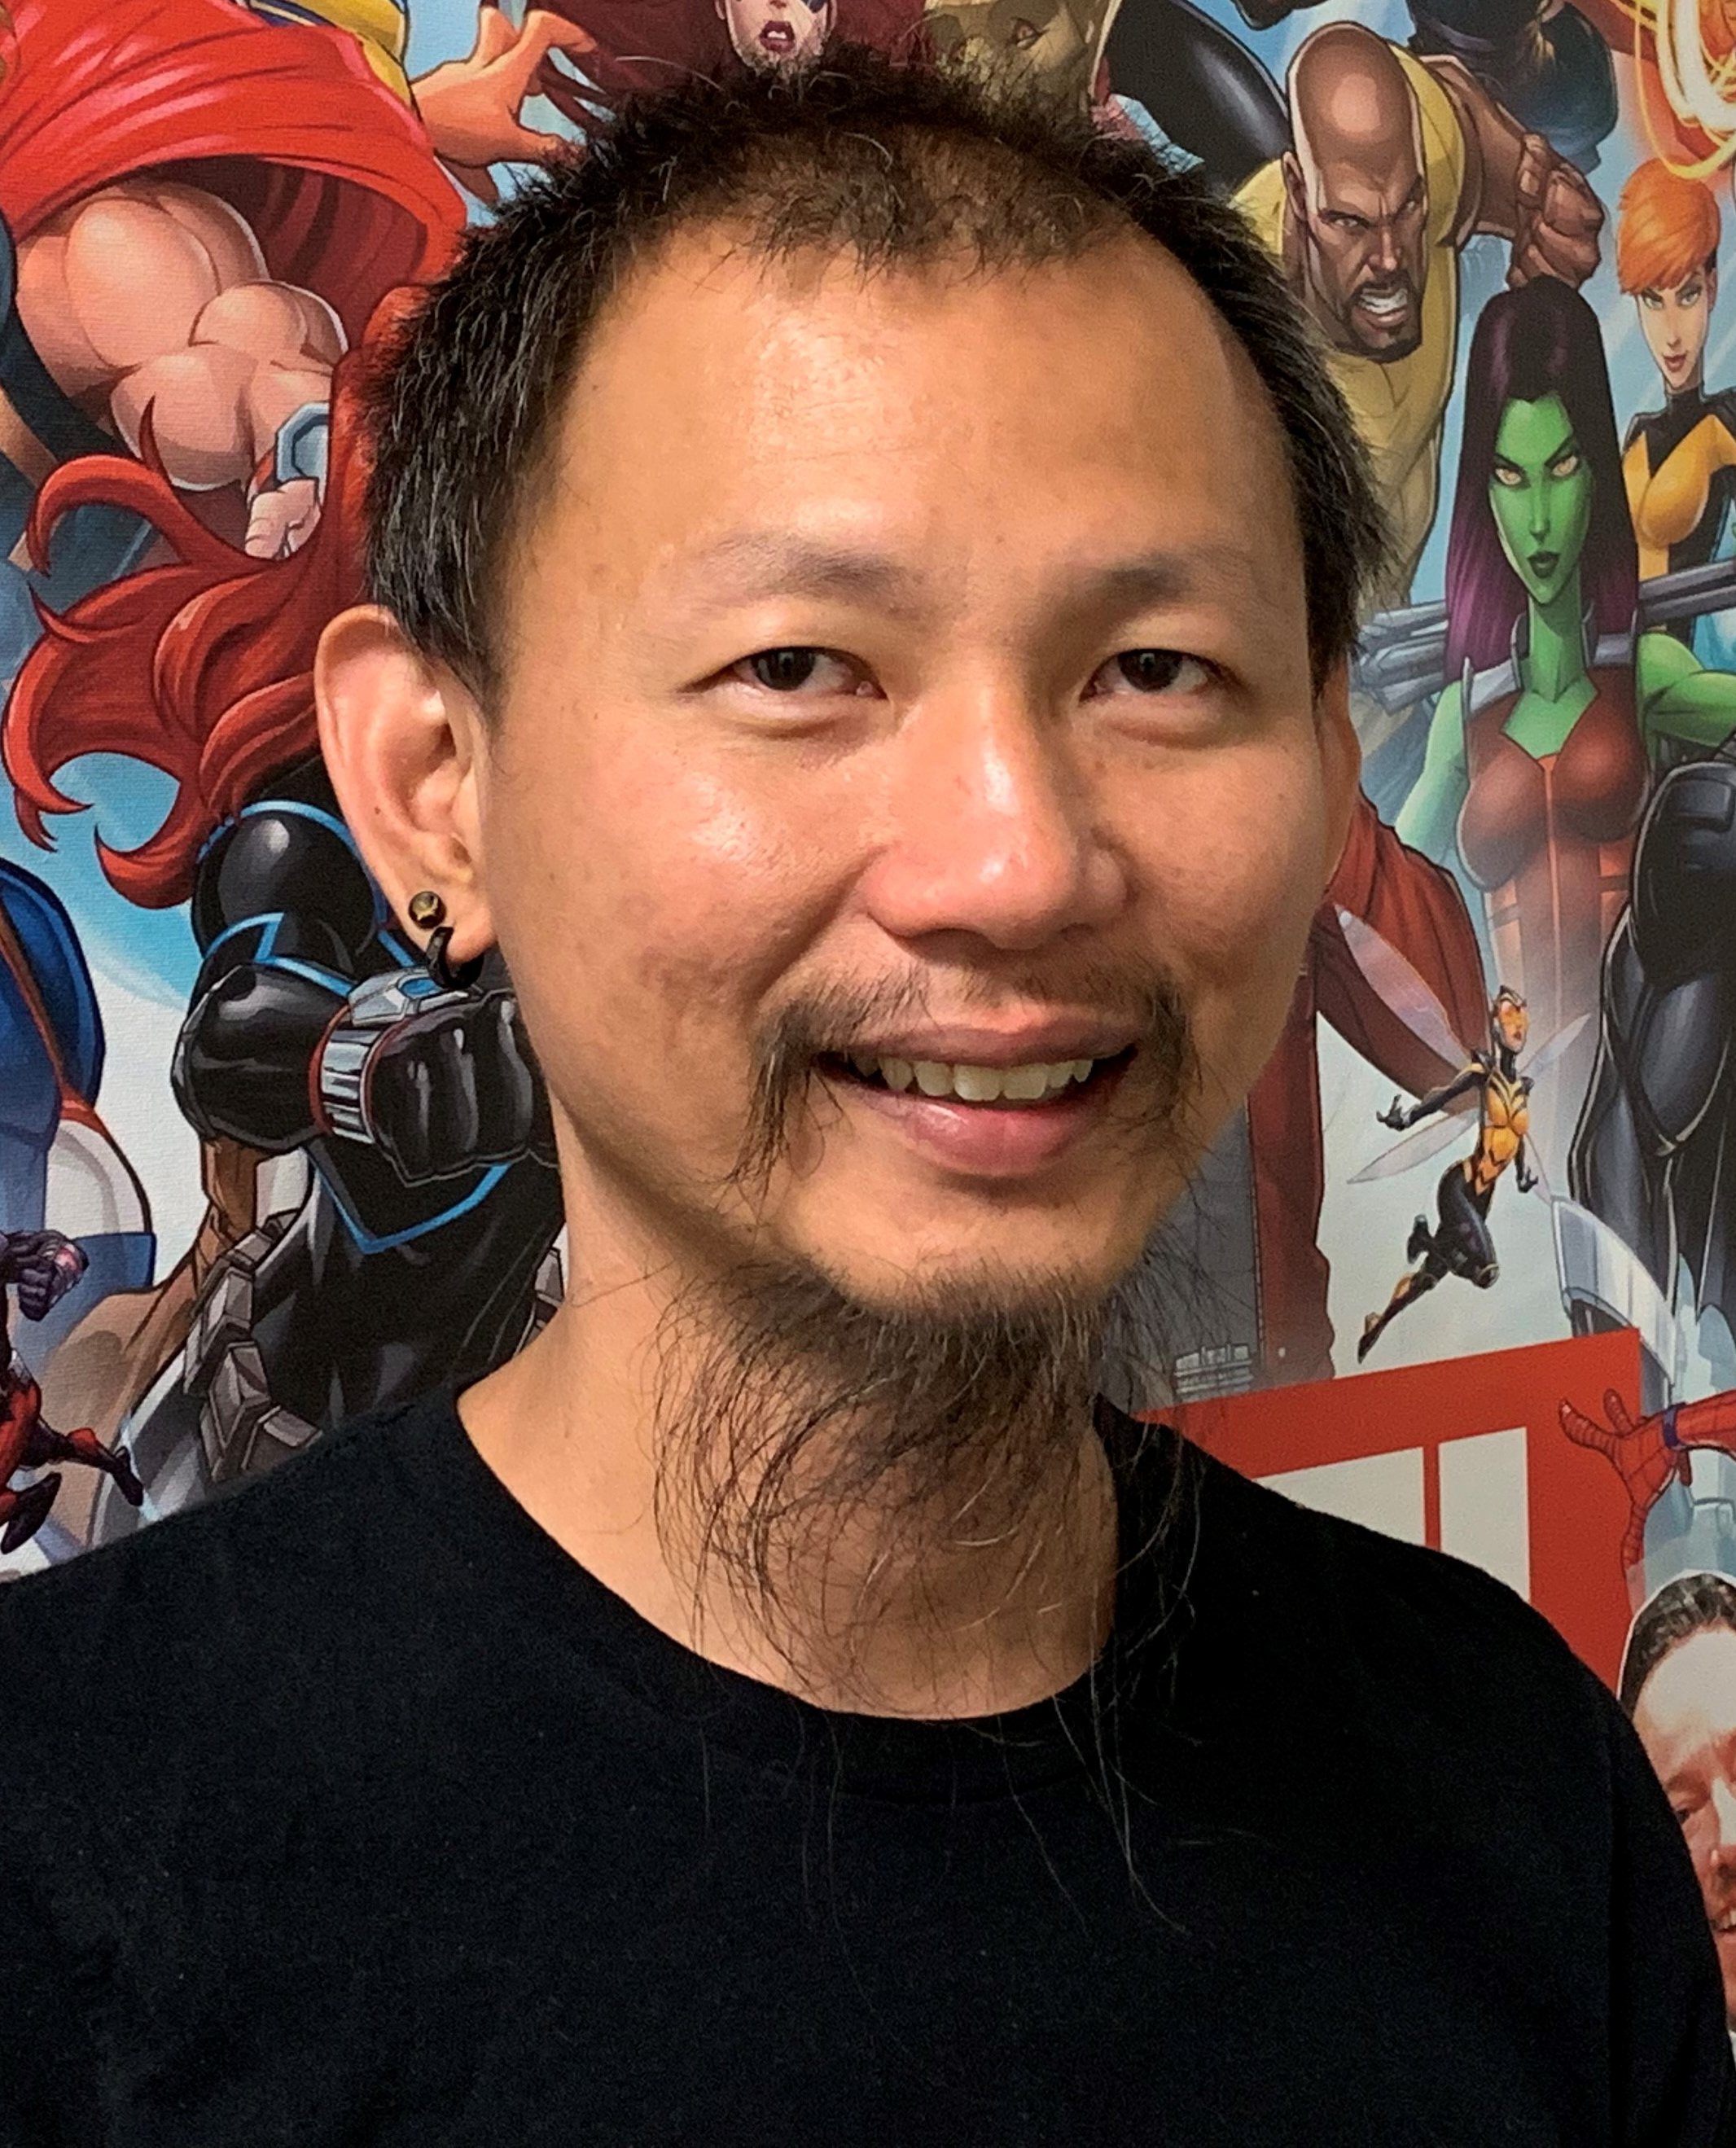 Danny Koo